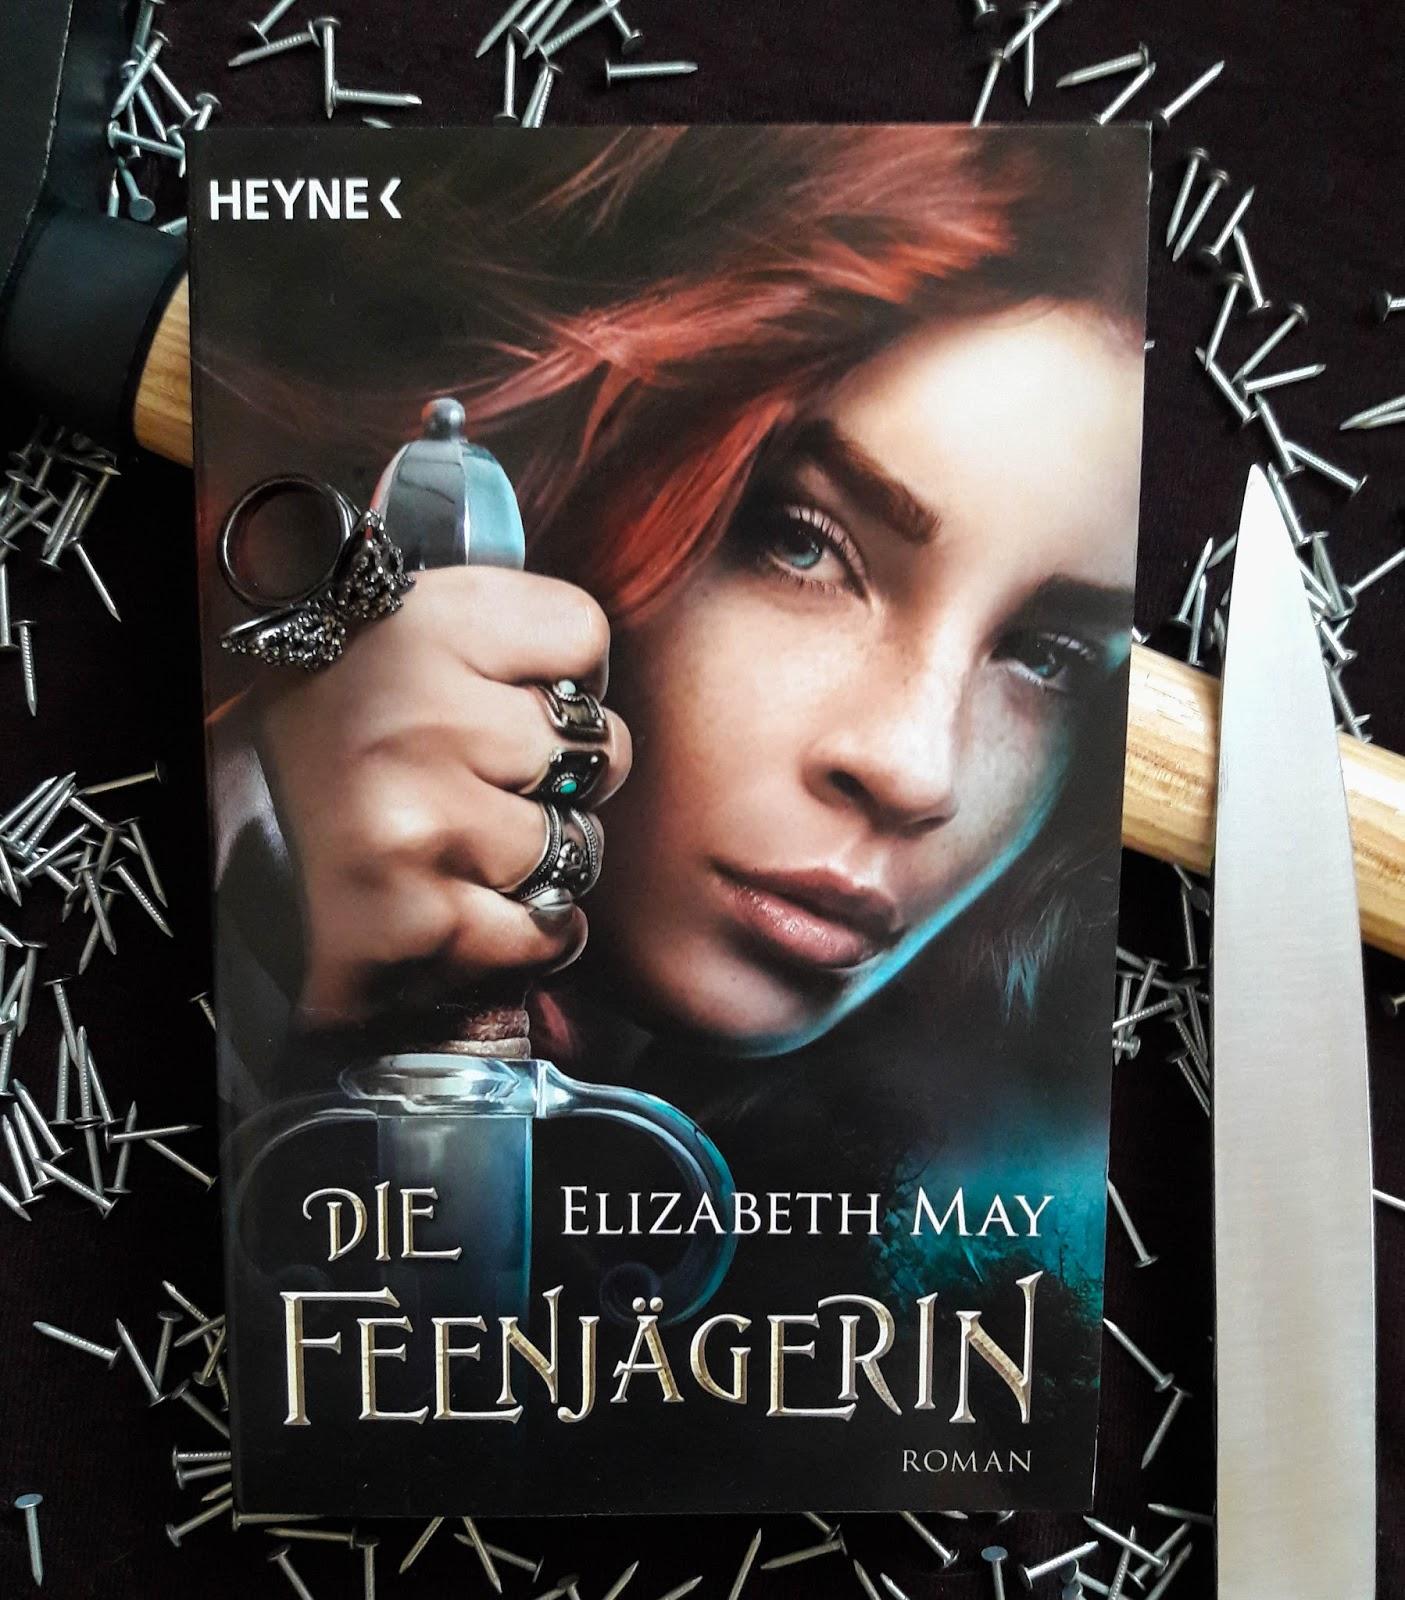 Die Feenjägerin – Elizabeth May graphic